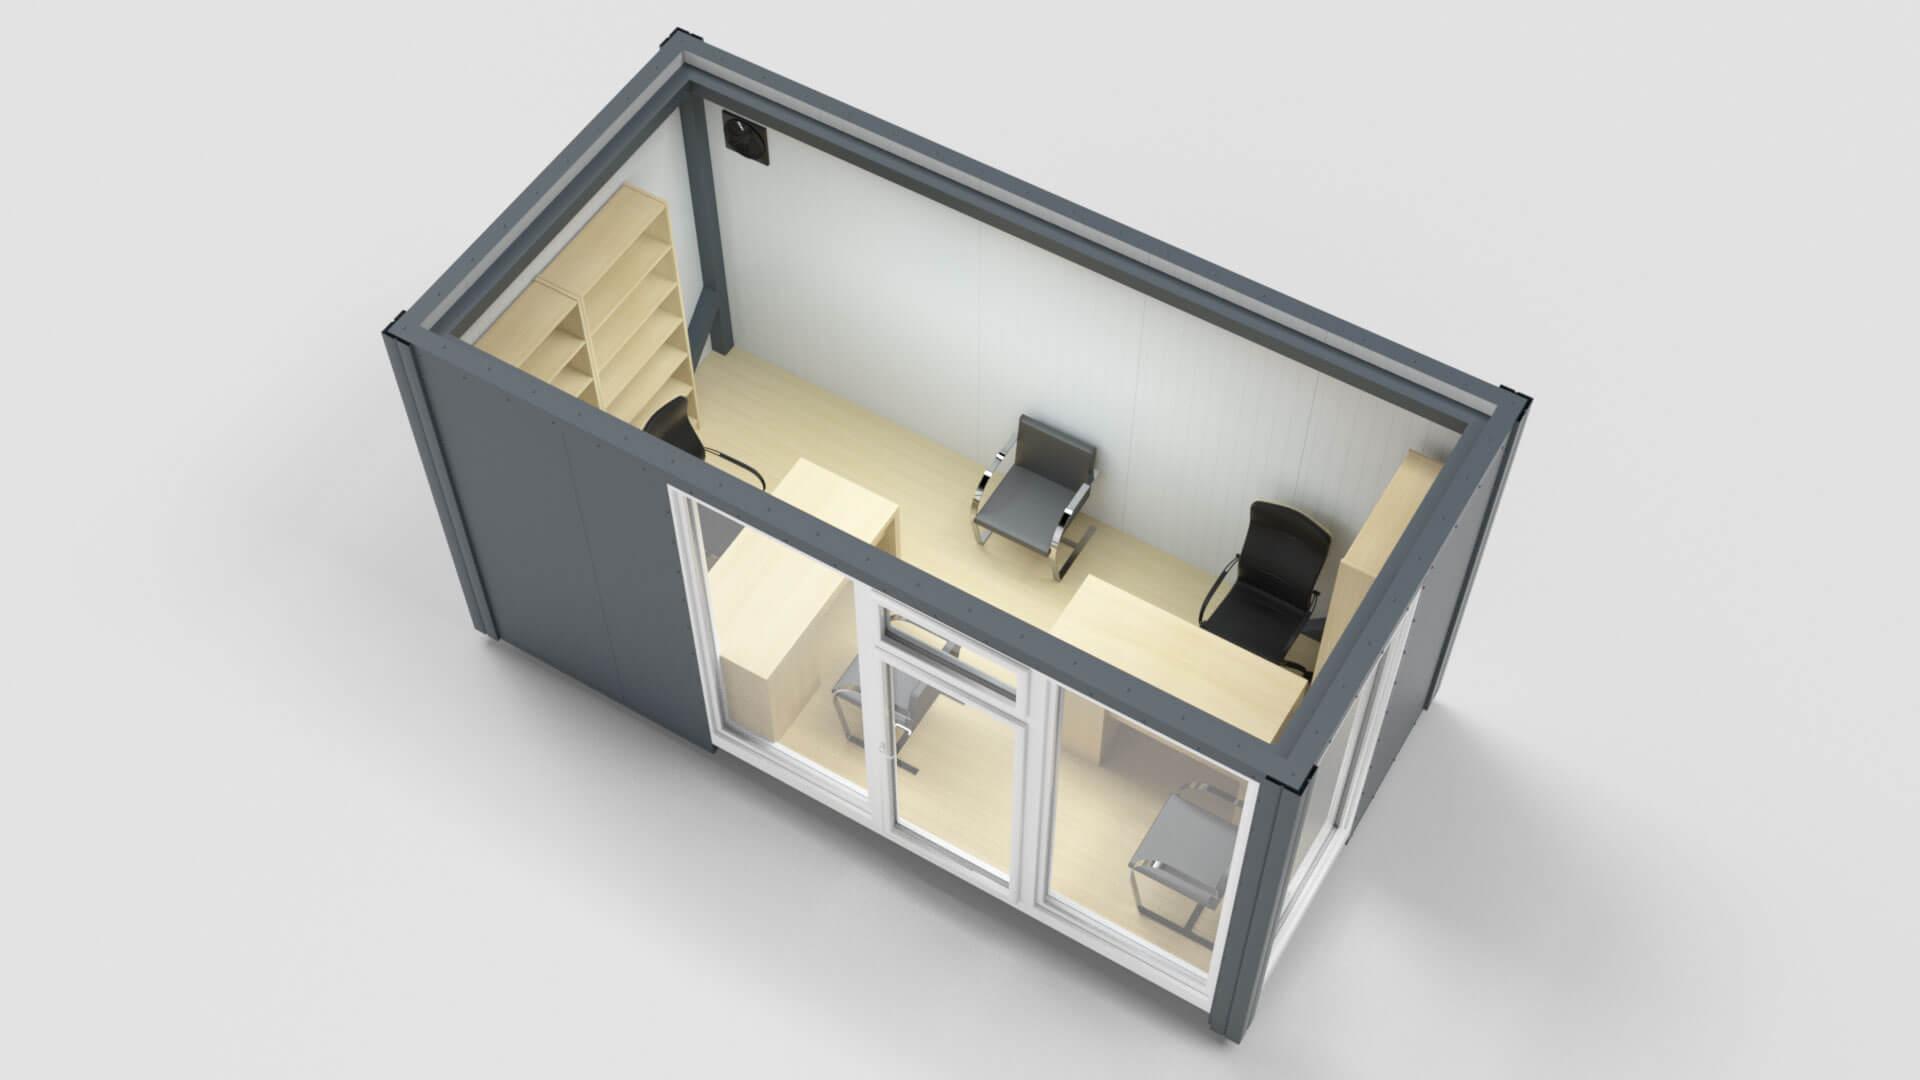 Office Container Pir Panels Sandwich Panels Polyurethane Plates Bokka